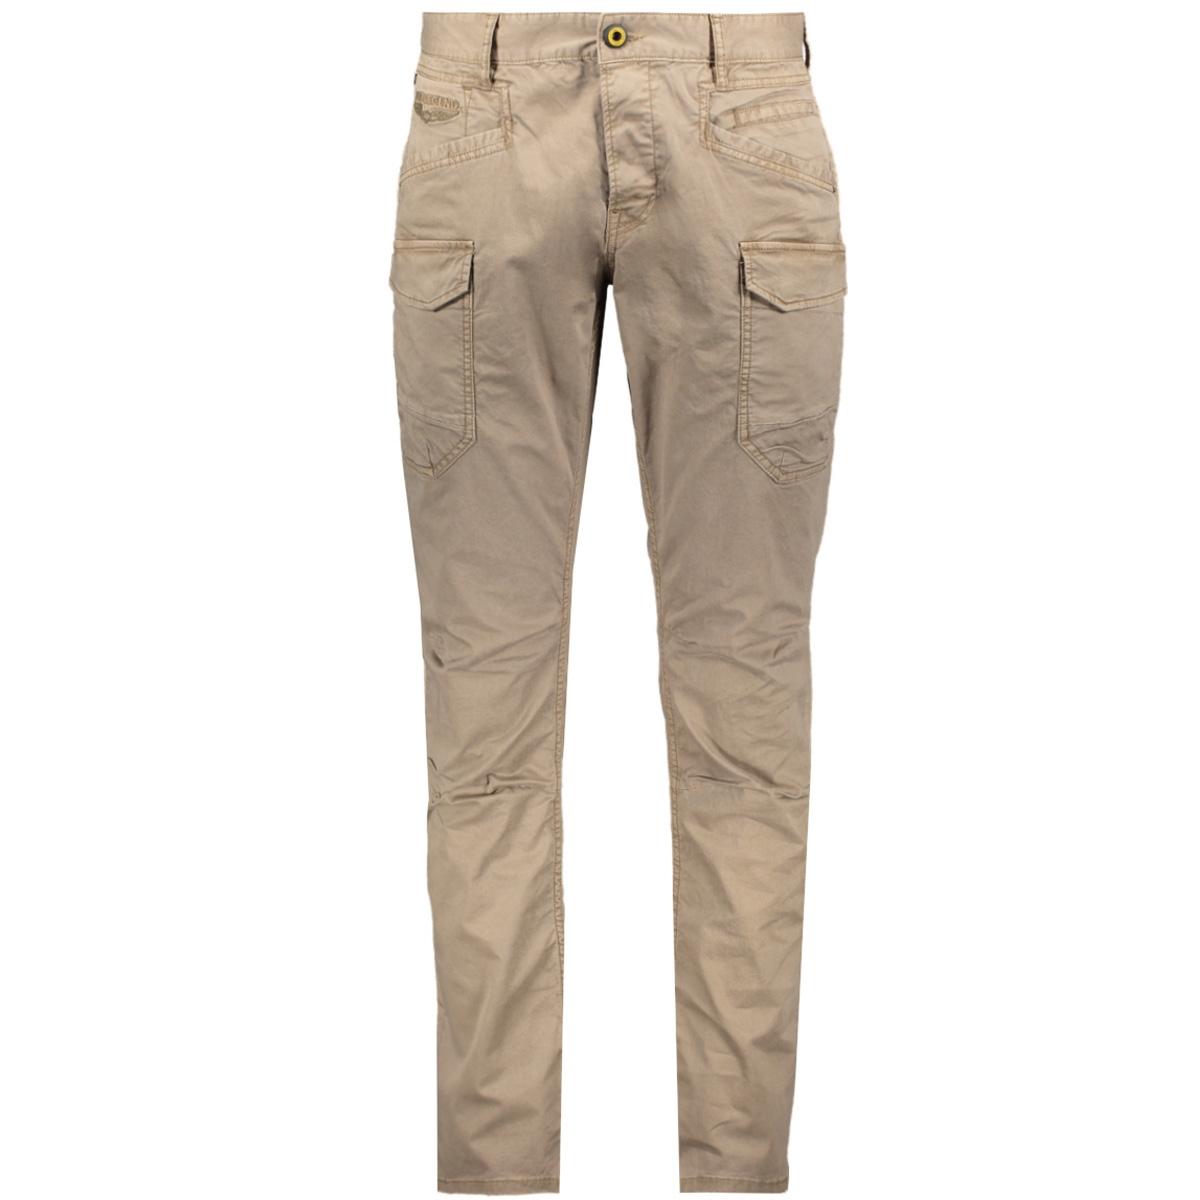 curtis cargo pants ptr193551 pme legend broek 8020